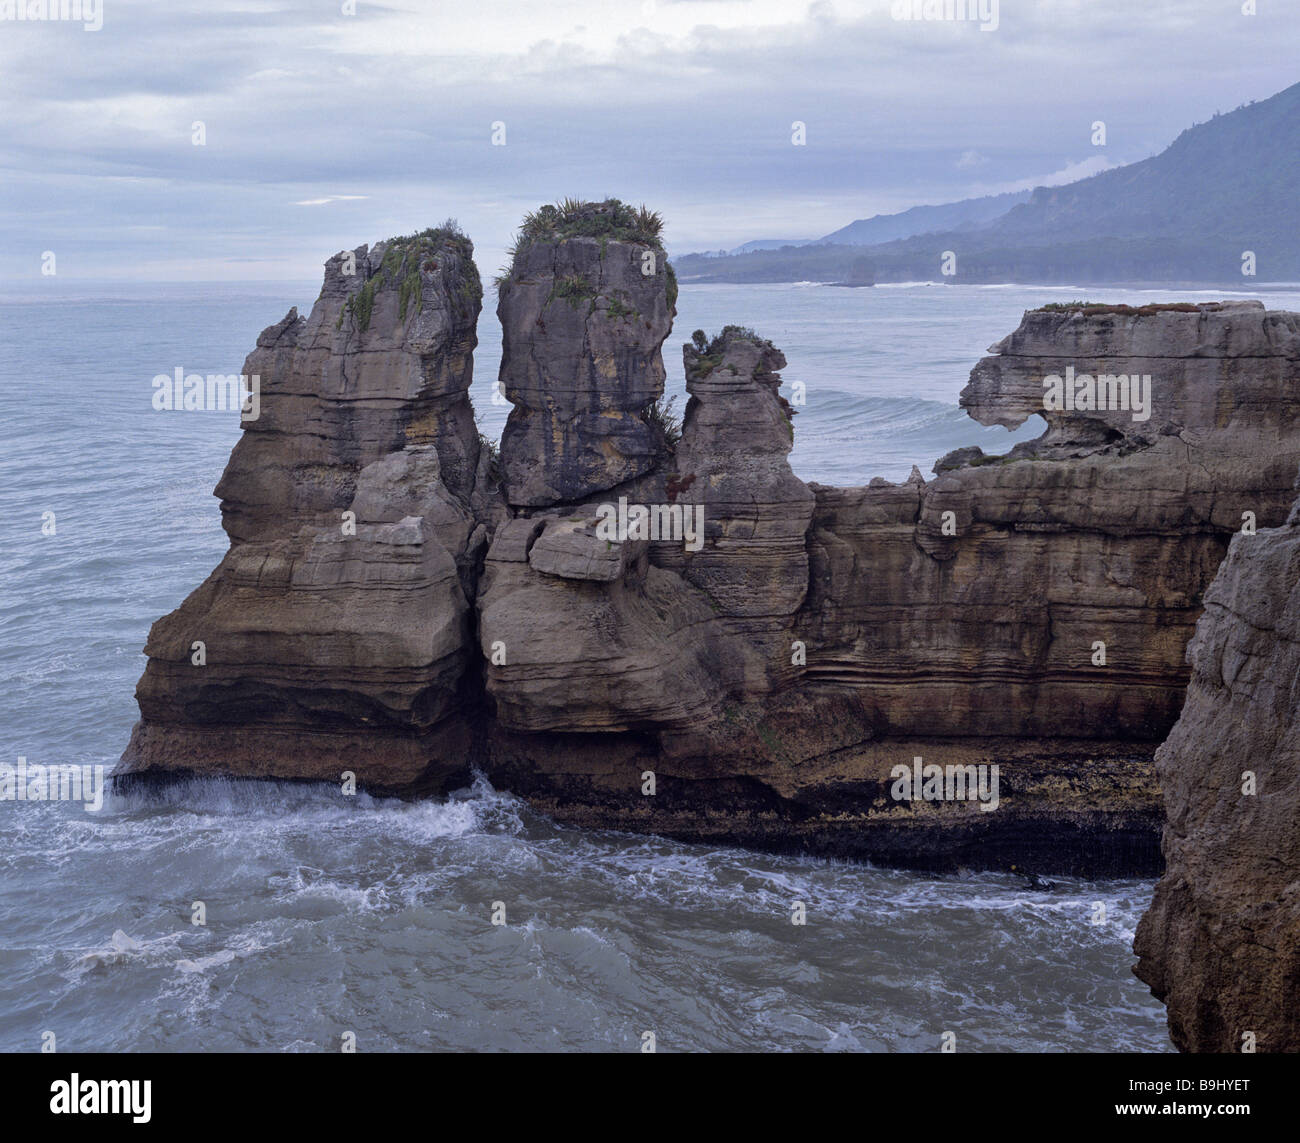 Pancake Rocks, rock formation in the Paparoa National Park, Punakaiki, South Island, New Zealand - Stock Image